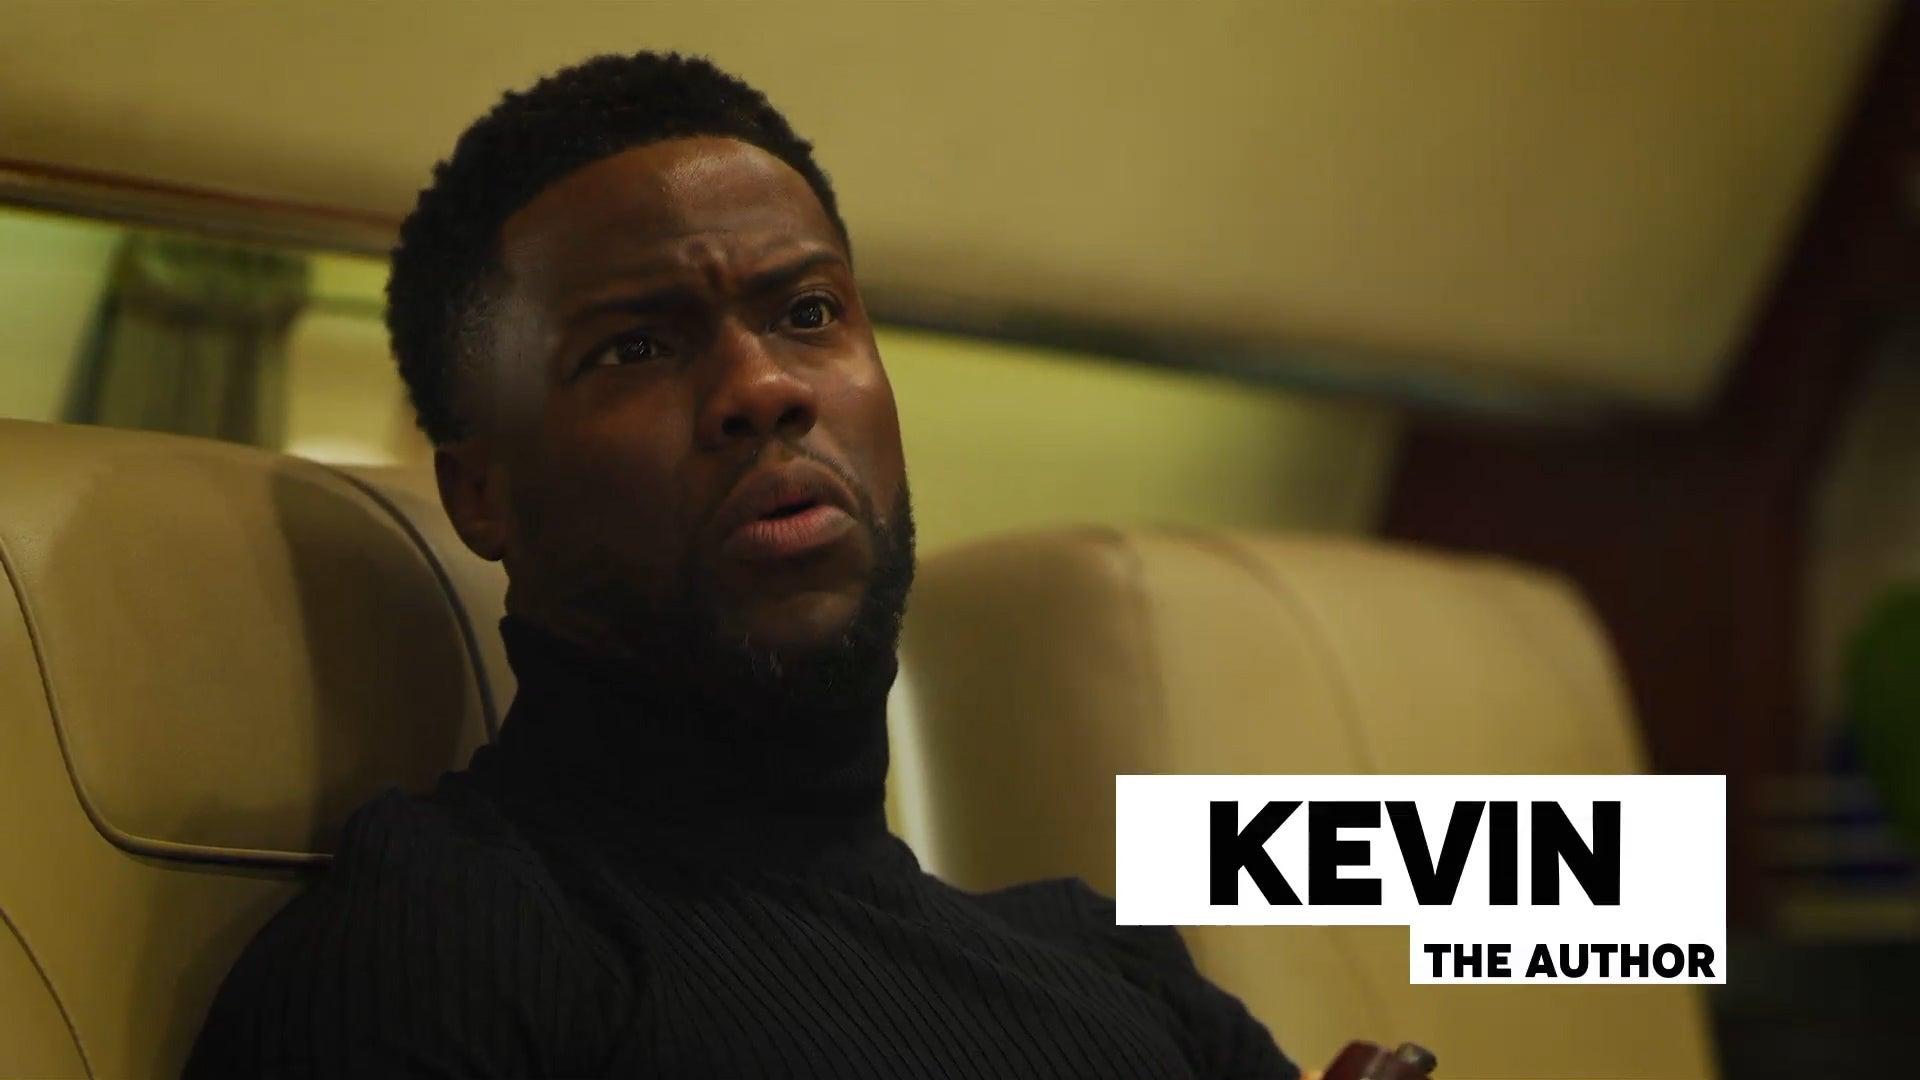 KevinHart_Trailer2018.jpg